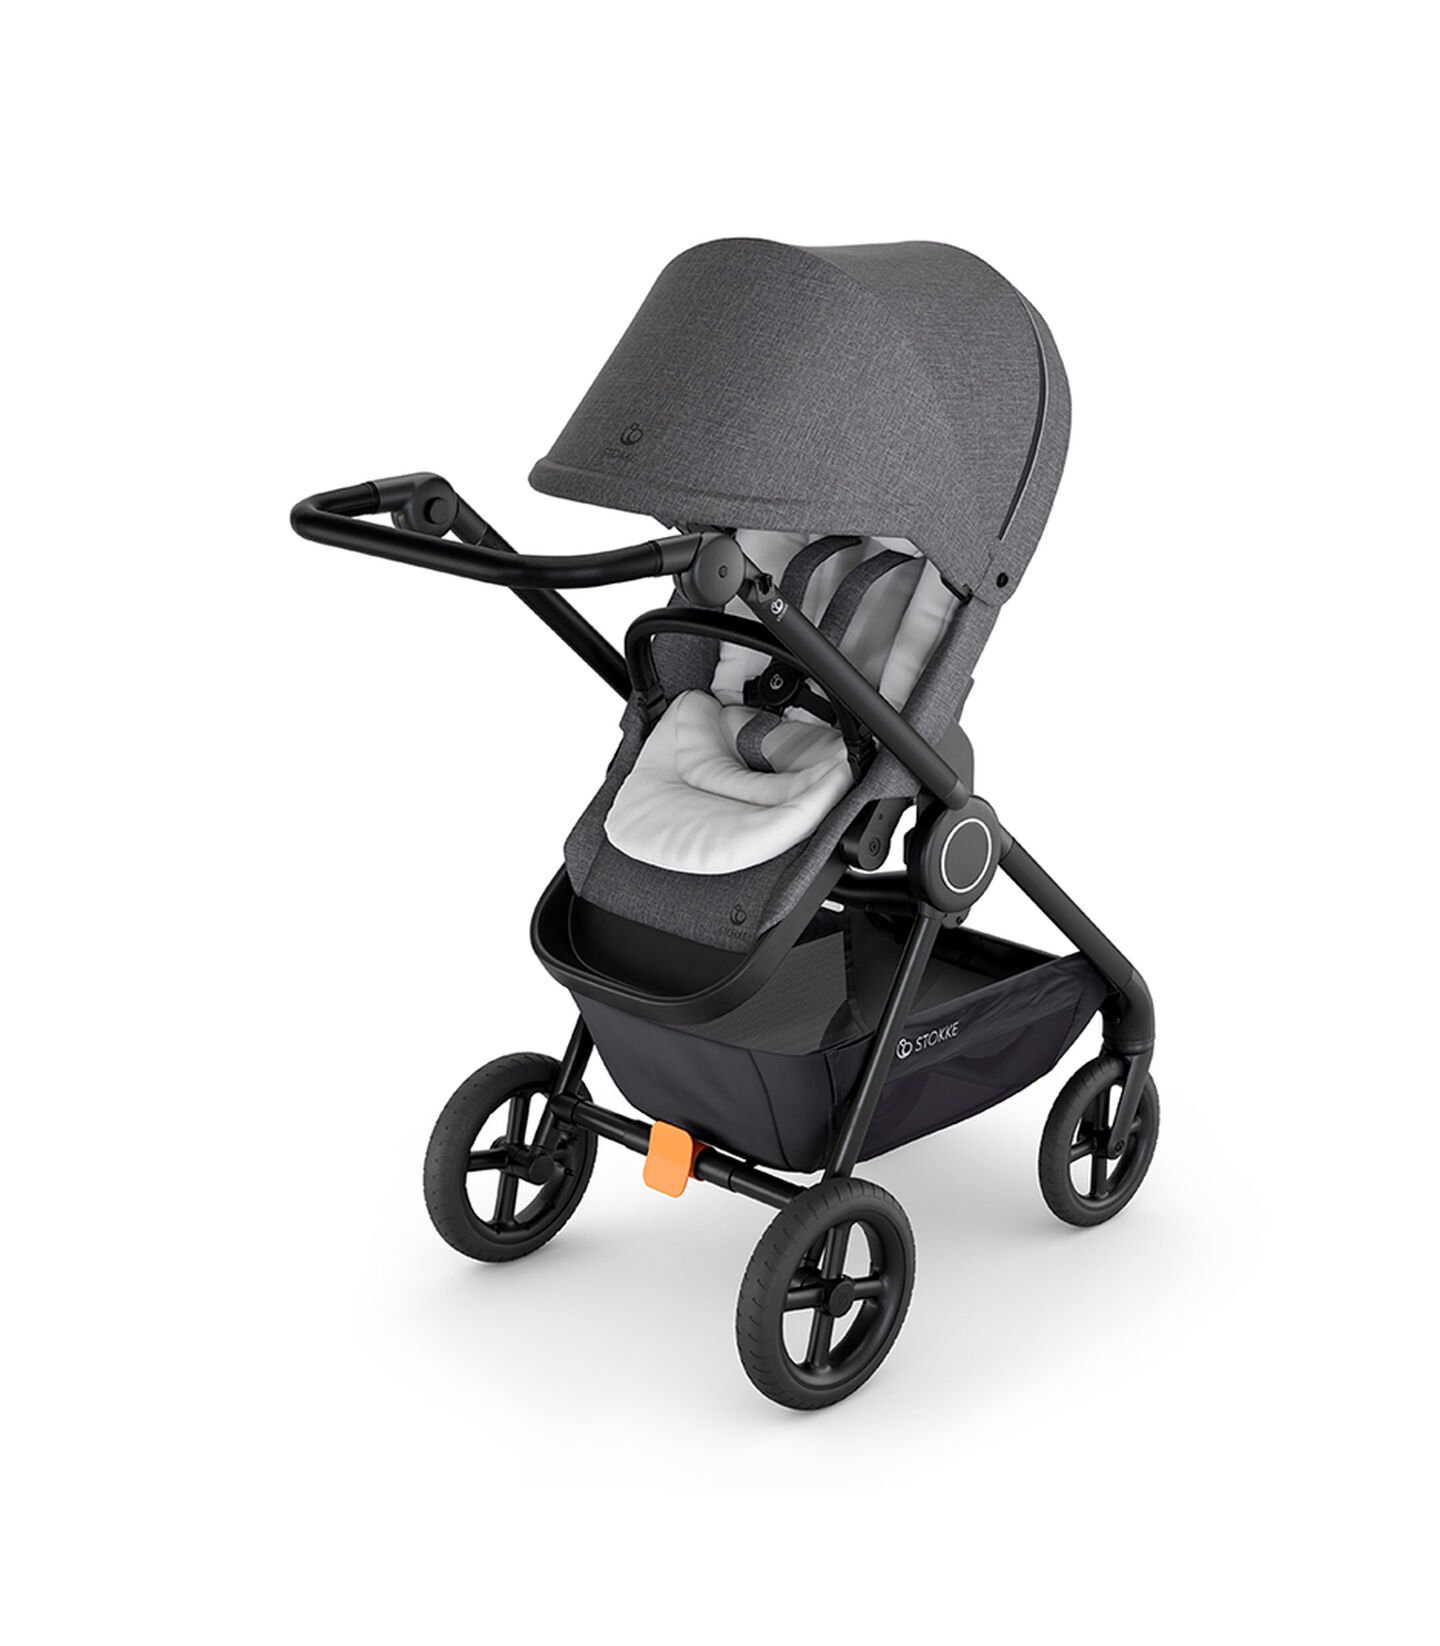 Stokke kinderwagen infant insert, , mainview view 1